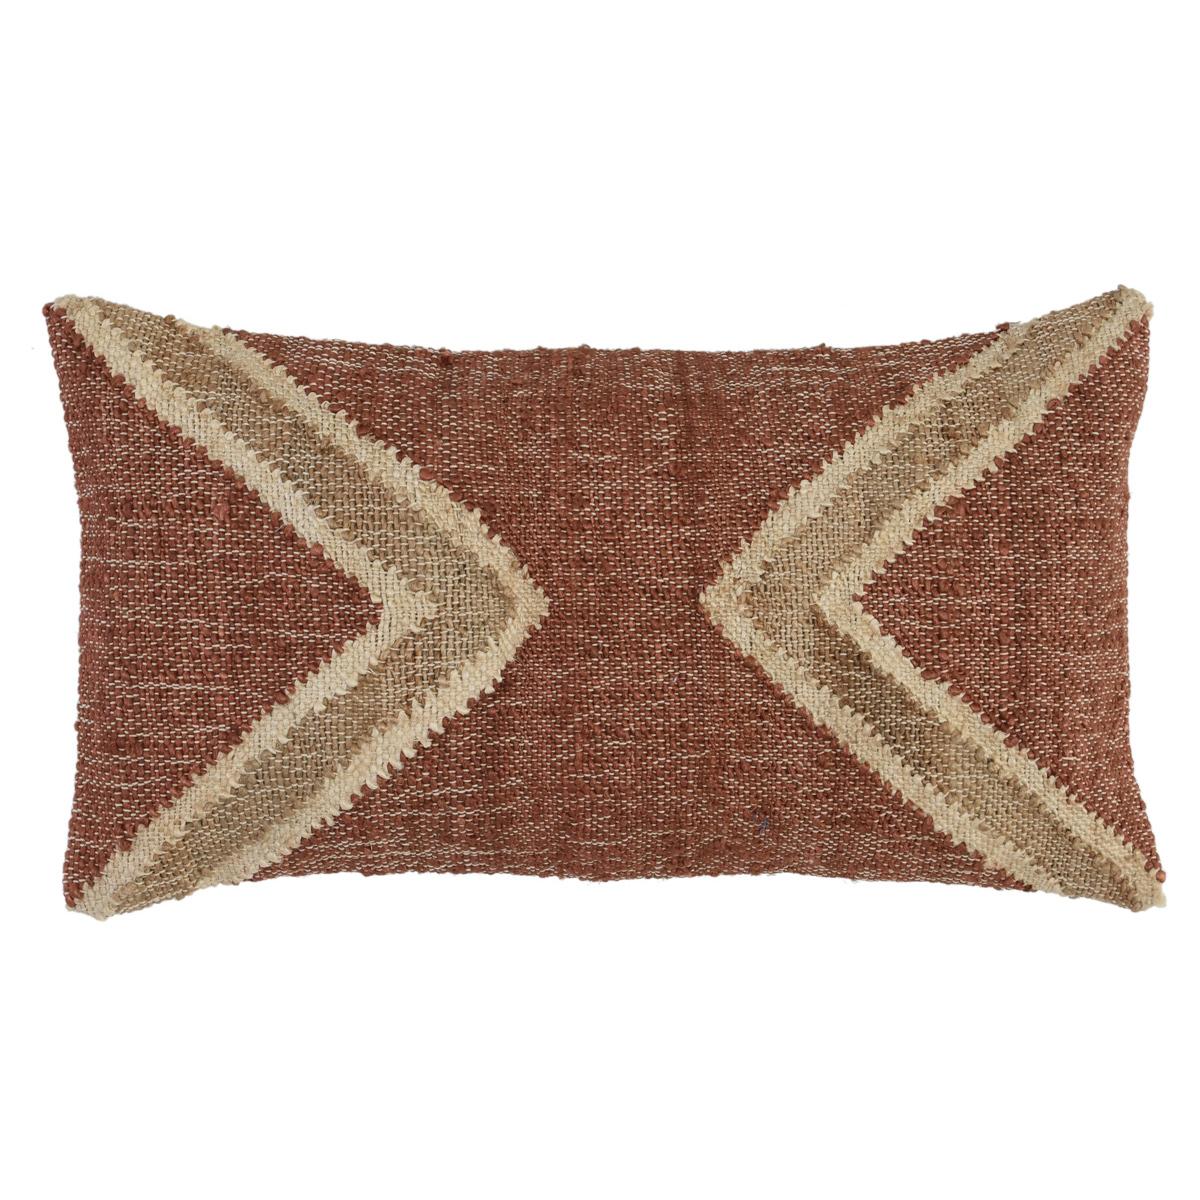 af mae antique copper 14x26 pillow by